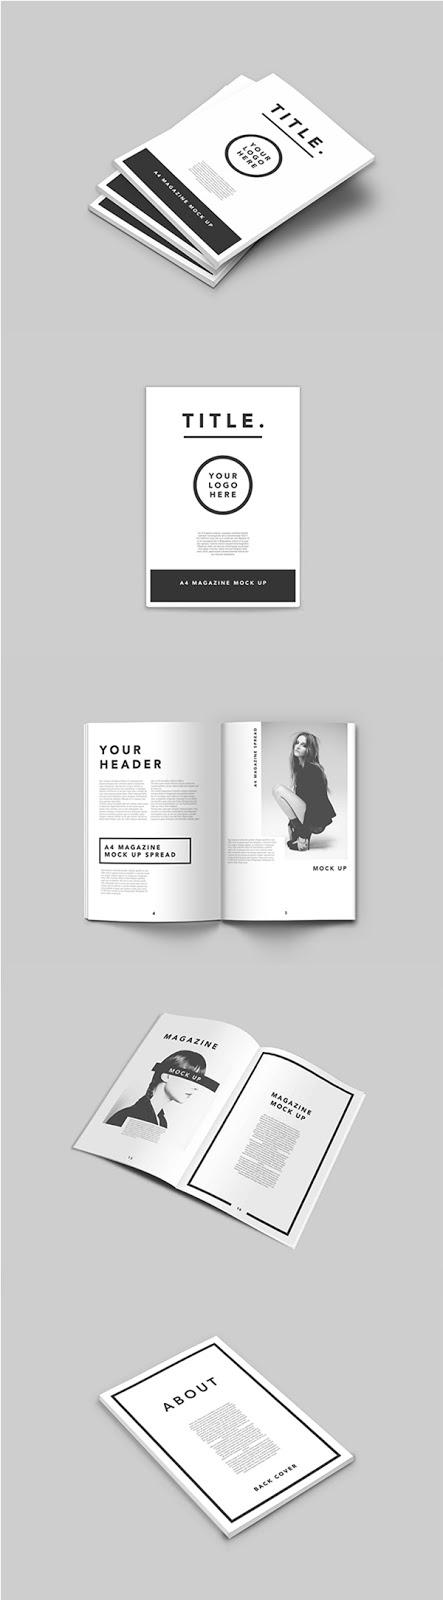 Download Gratis Mockup Majalah, Brosur, Buku, Cover - A4 Magazine Mock Up